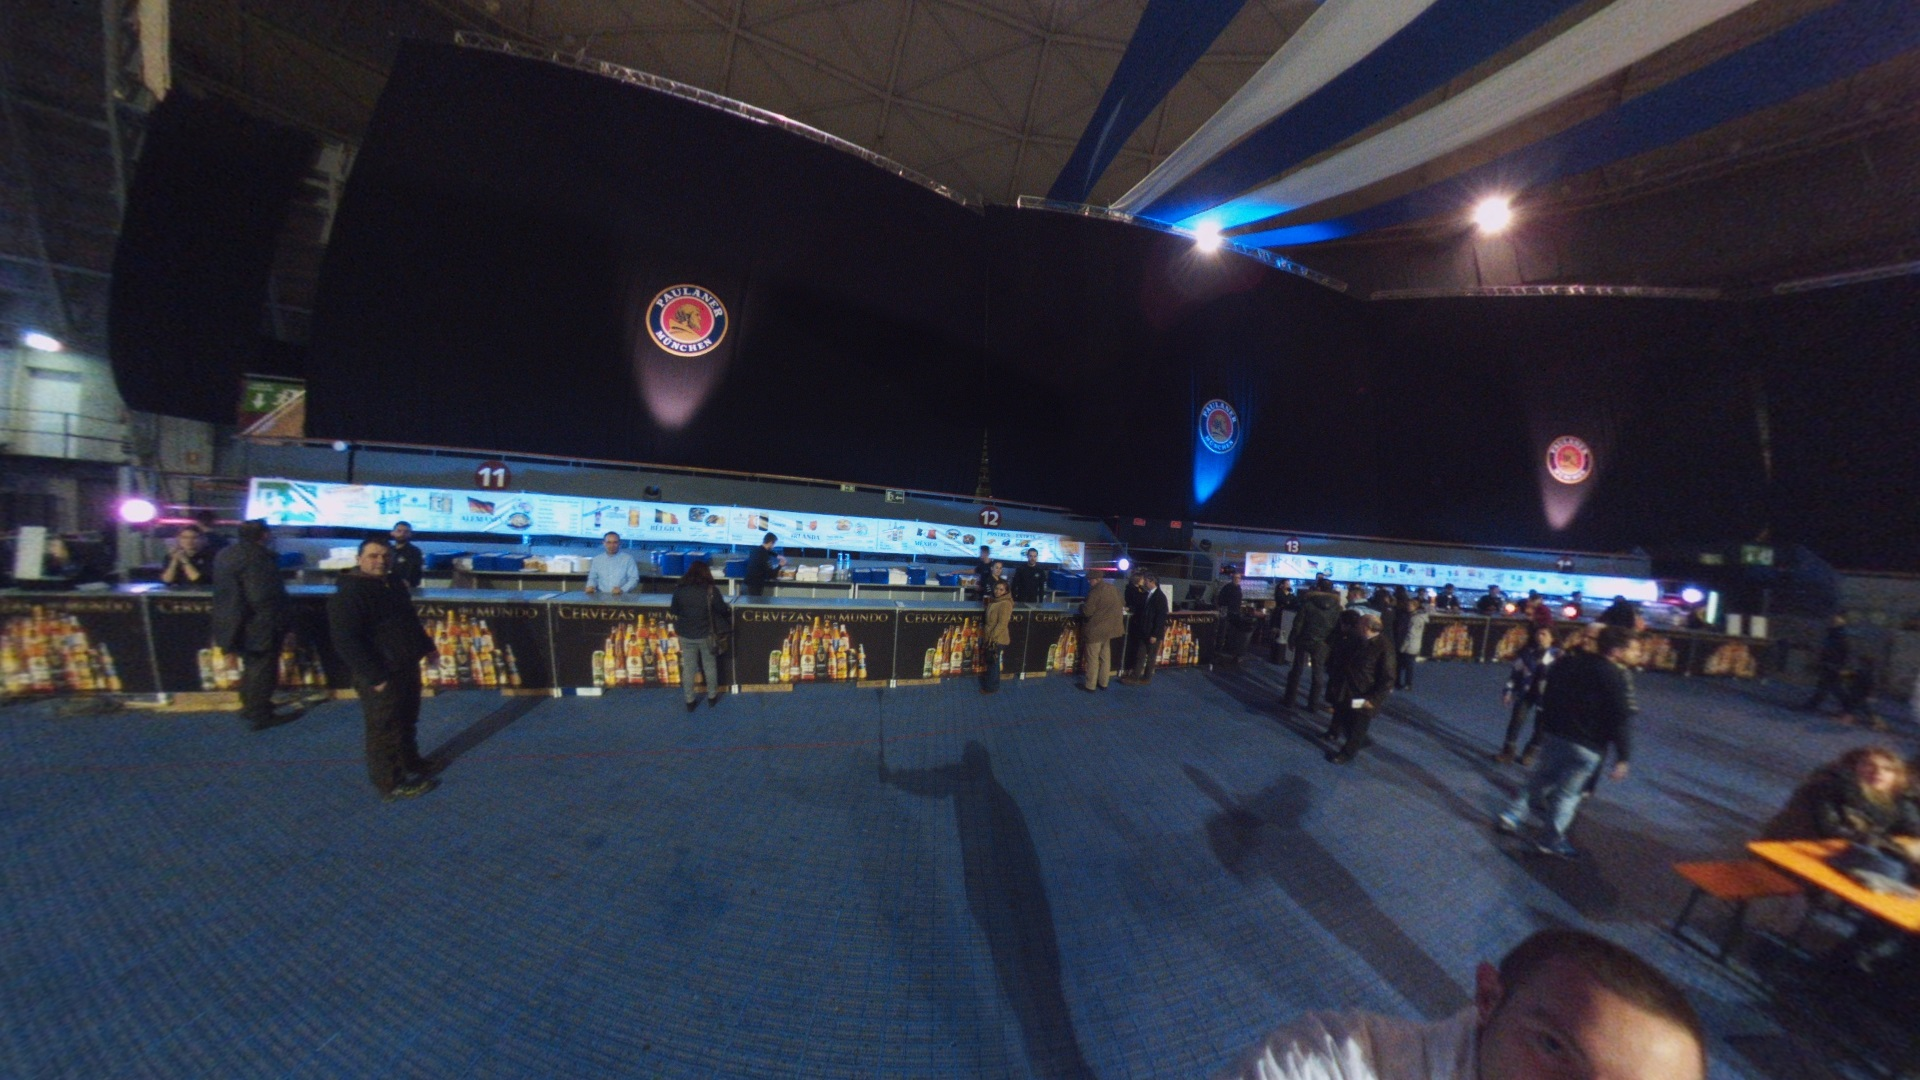 Fotos 360 Barras de la feria de la cerveza.#VidePan en #FeriaCervezaMad